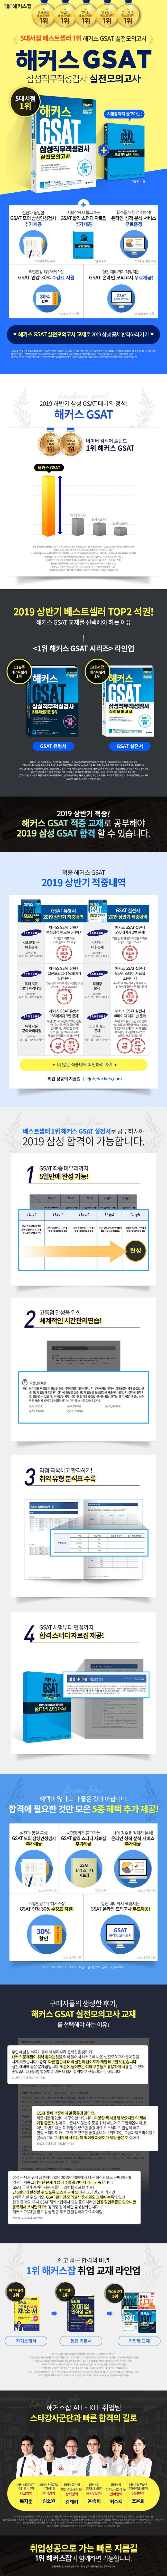 GSAT삼성직무적성검사 실전모의고사(2019 하반기)(해커스) 도서 상세이미지